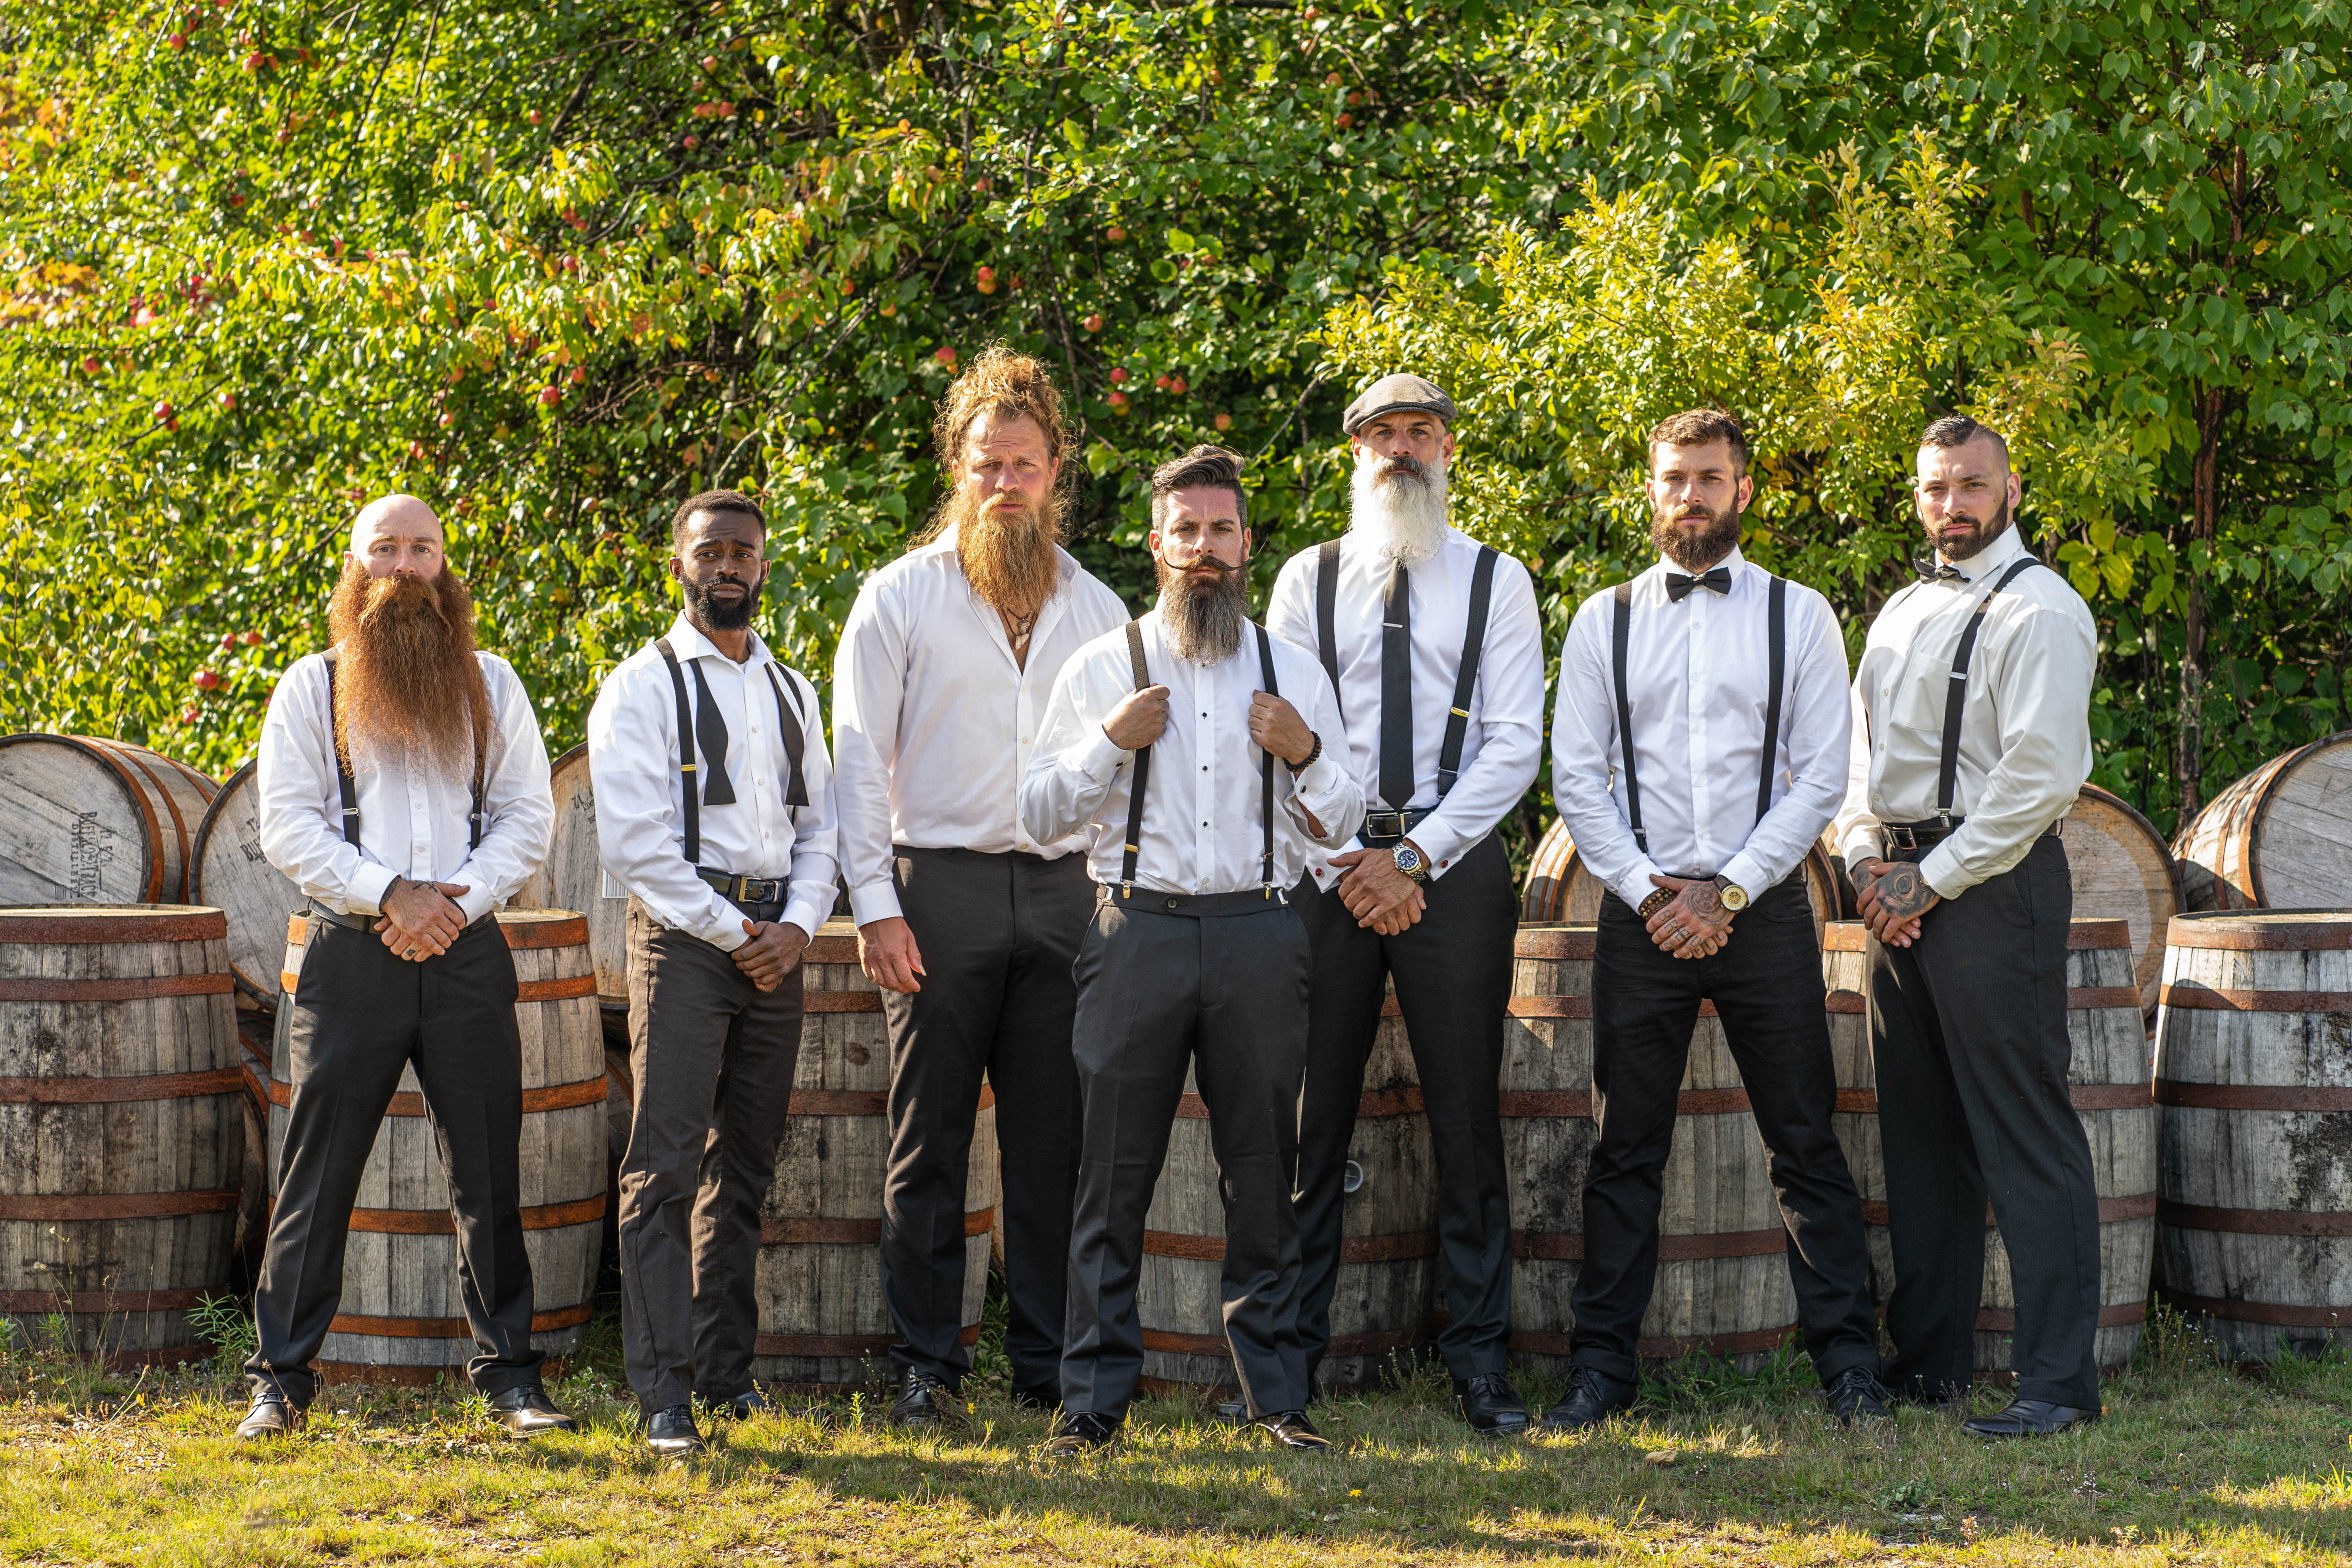 A few of the Educated Beards Ambassadors.